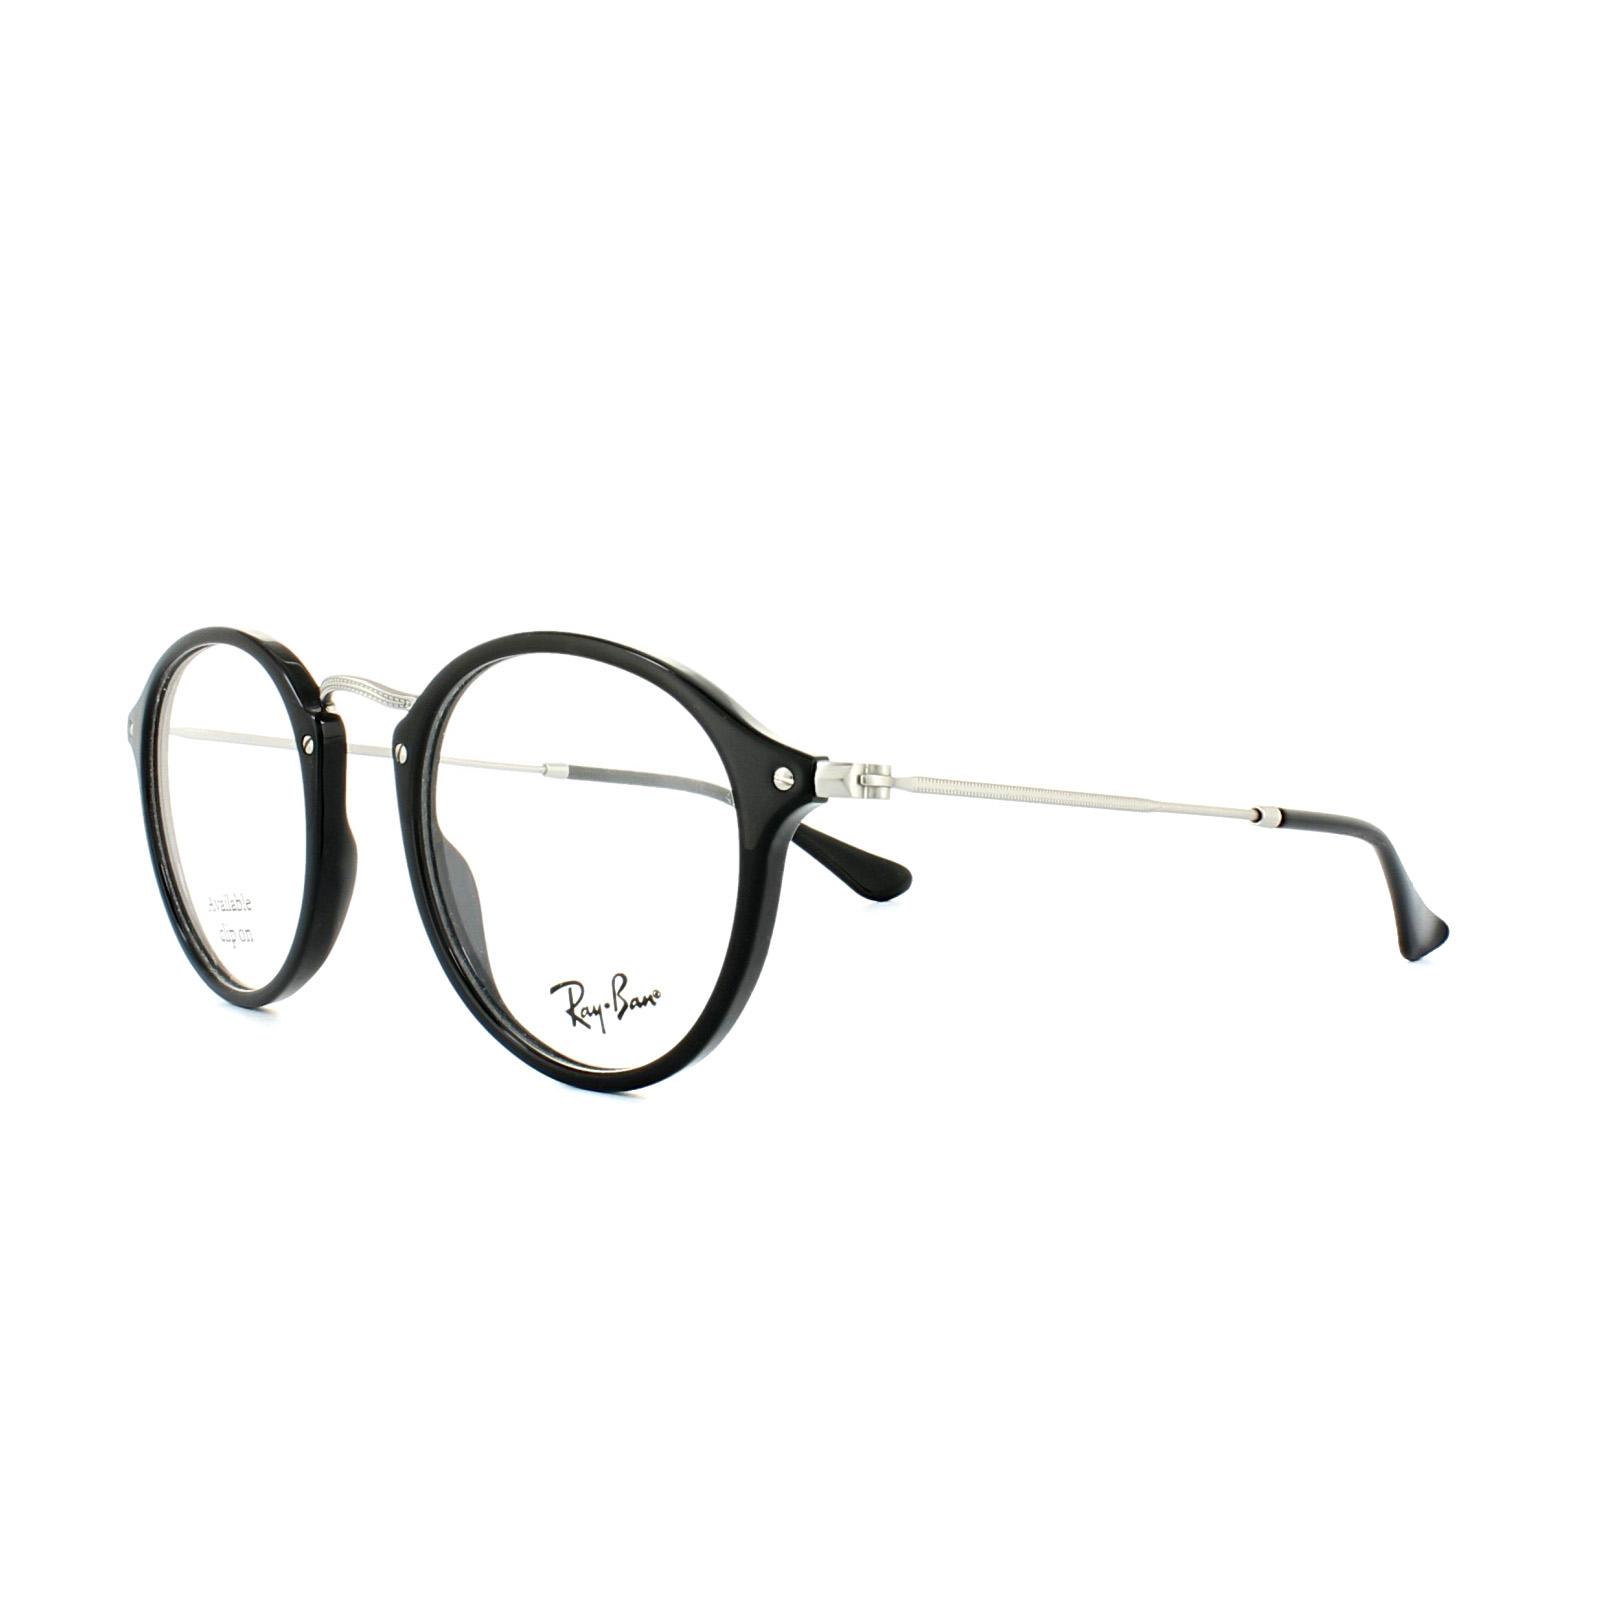 e2bbd09f9cc Sentinel Ray-Ban Glasses Frames 2447V 2000 Shiny Black Mens Womens 47mm